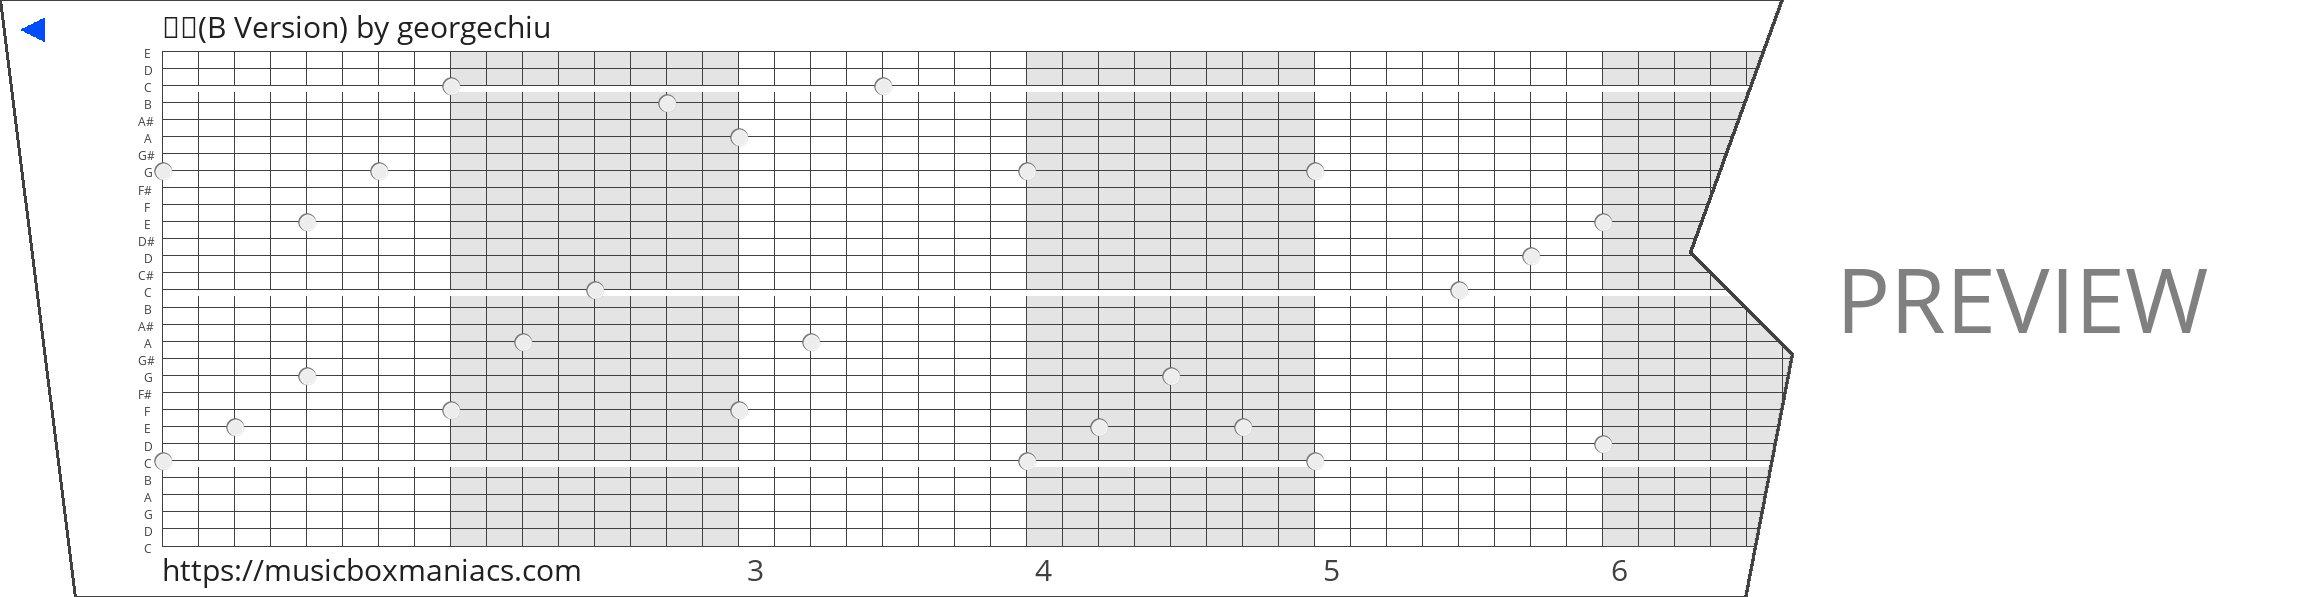 送别(B Version) 30 note music box paper strip